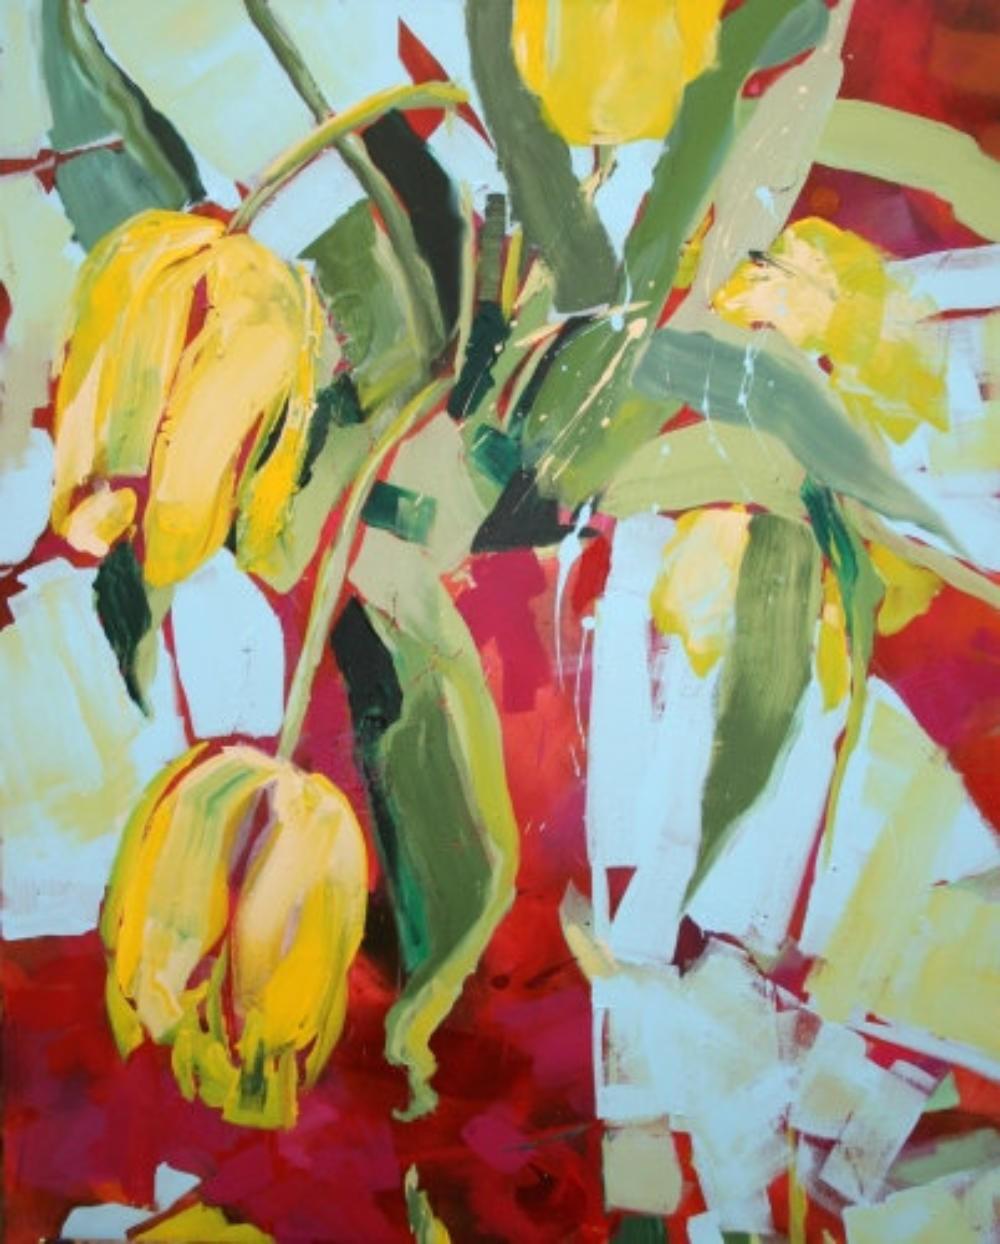 Gelbe Tulpen in der Vase